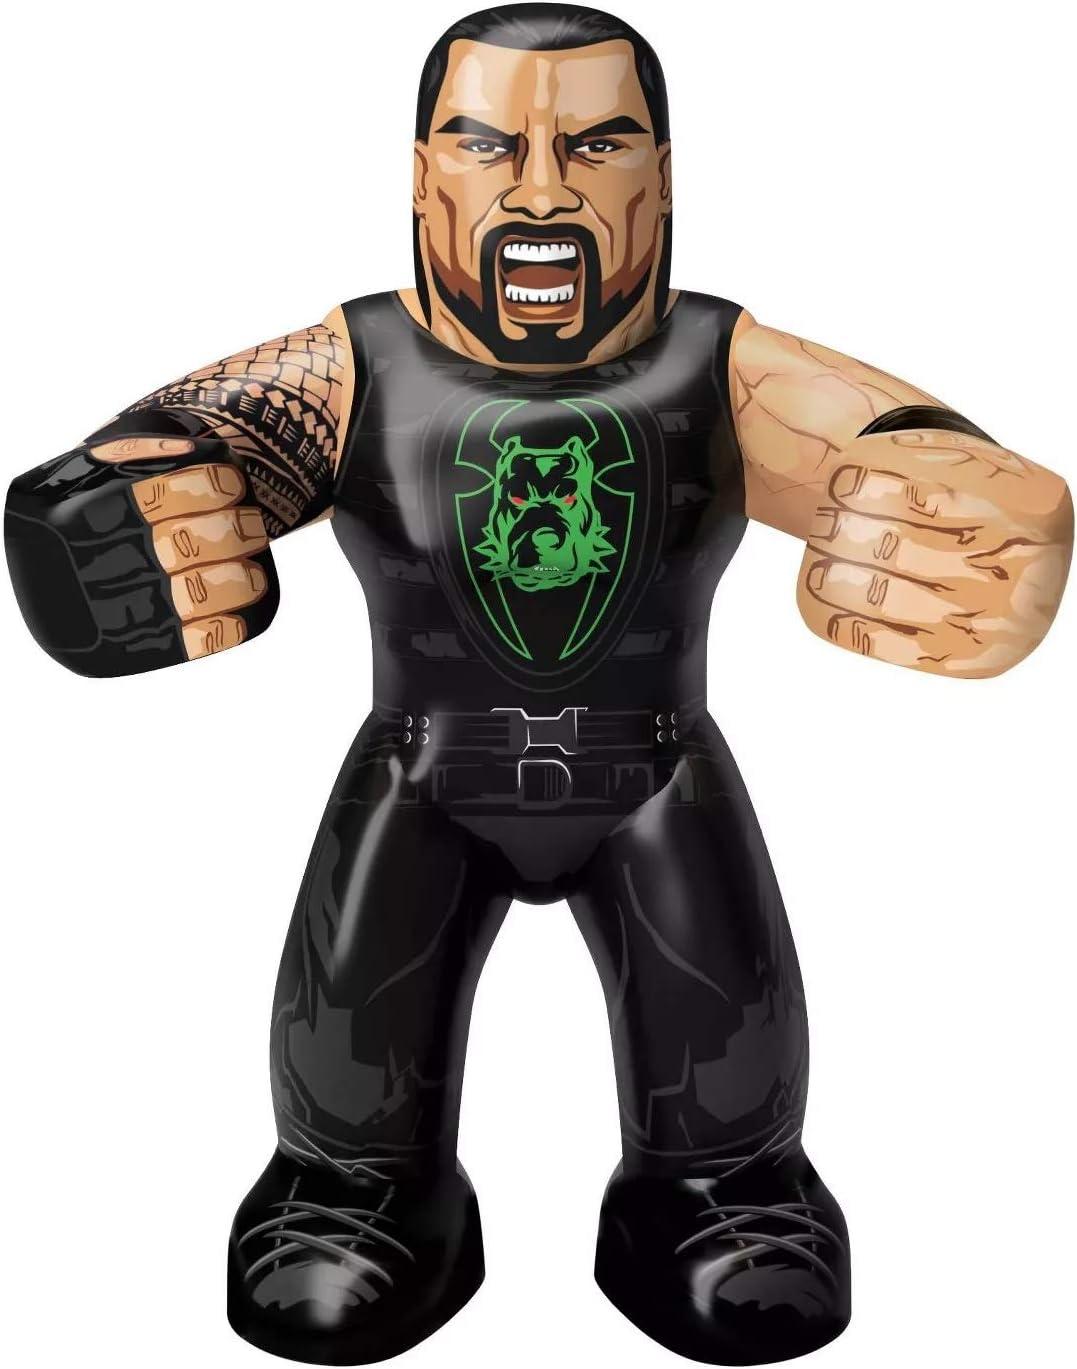 Wubble Outlet sale Max 61% OFF feature Rumblers WWE Reigns Roman